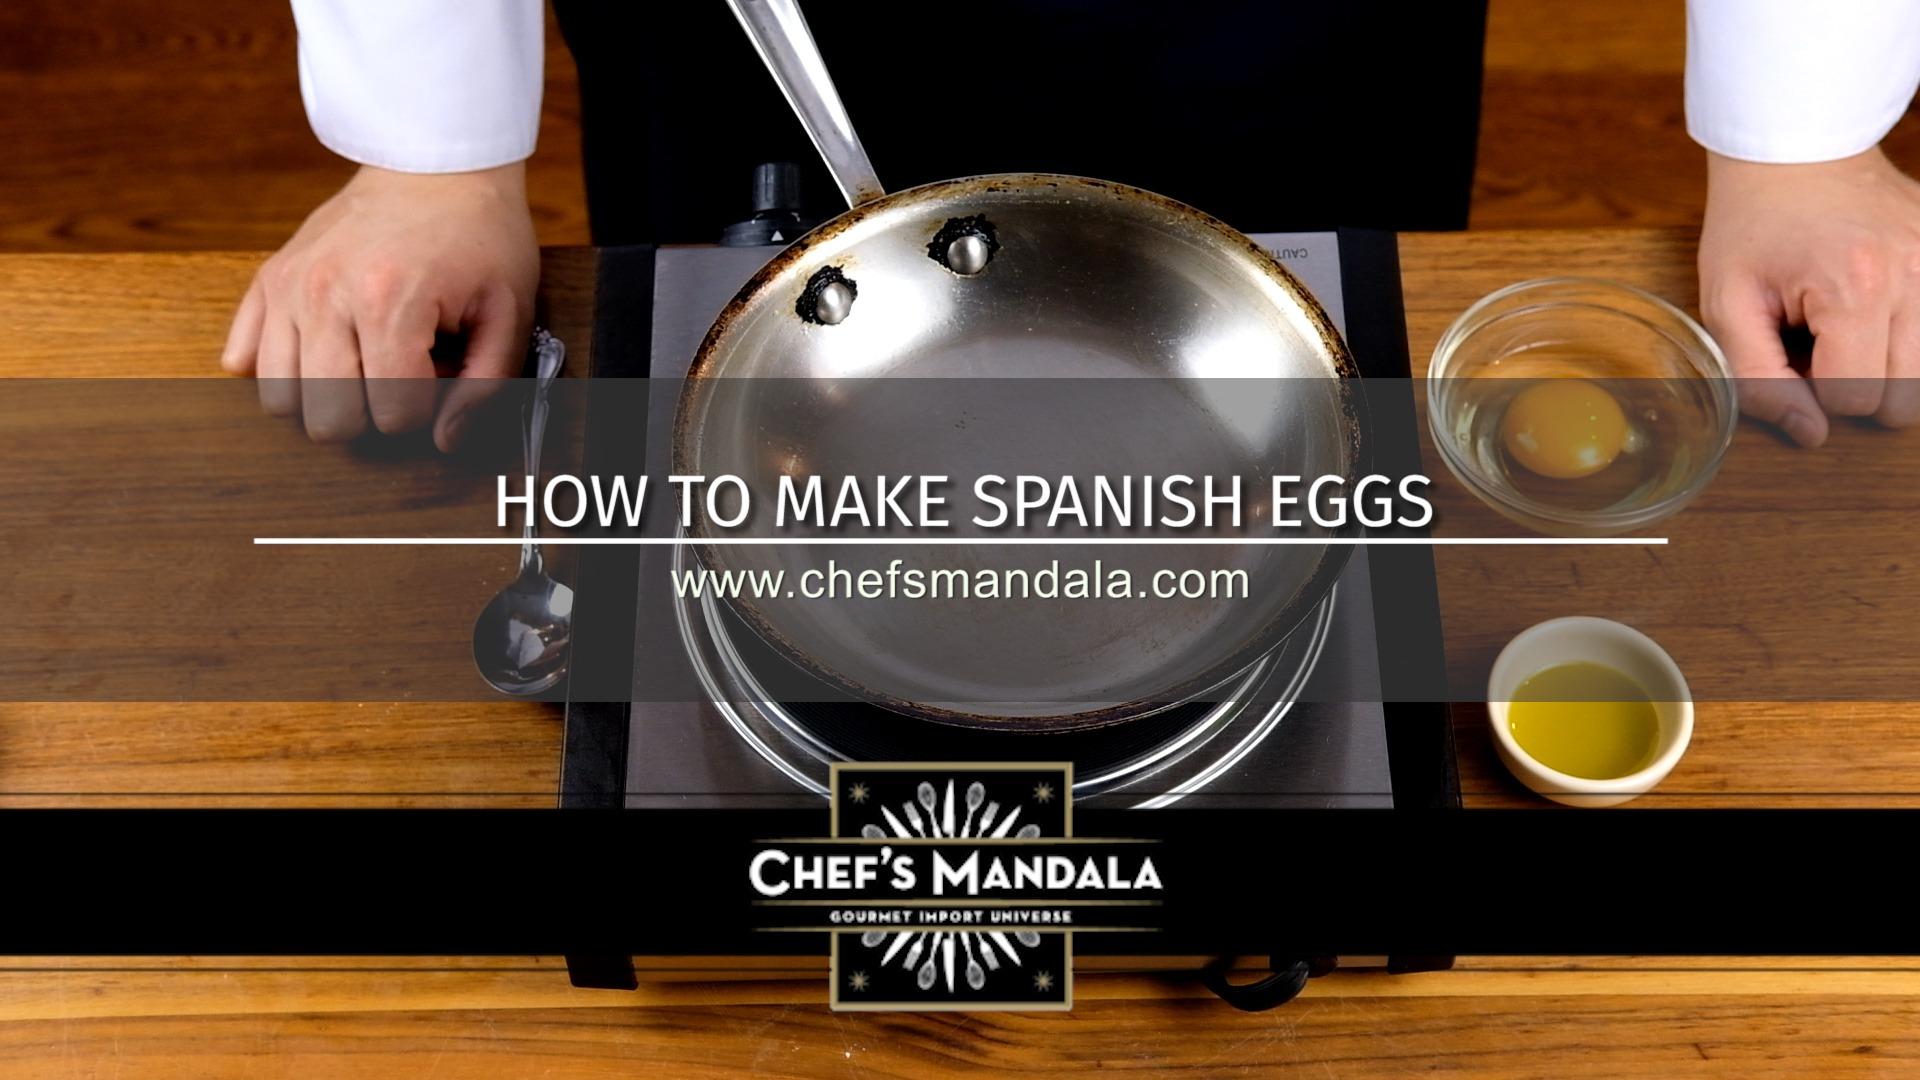 How to make Spanish eggs